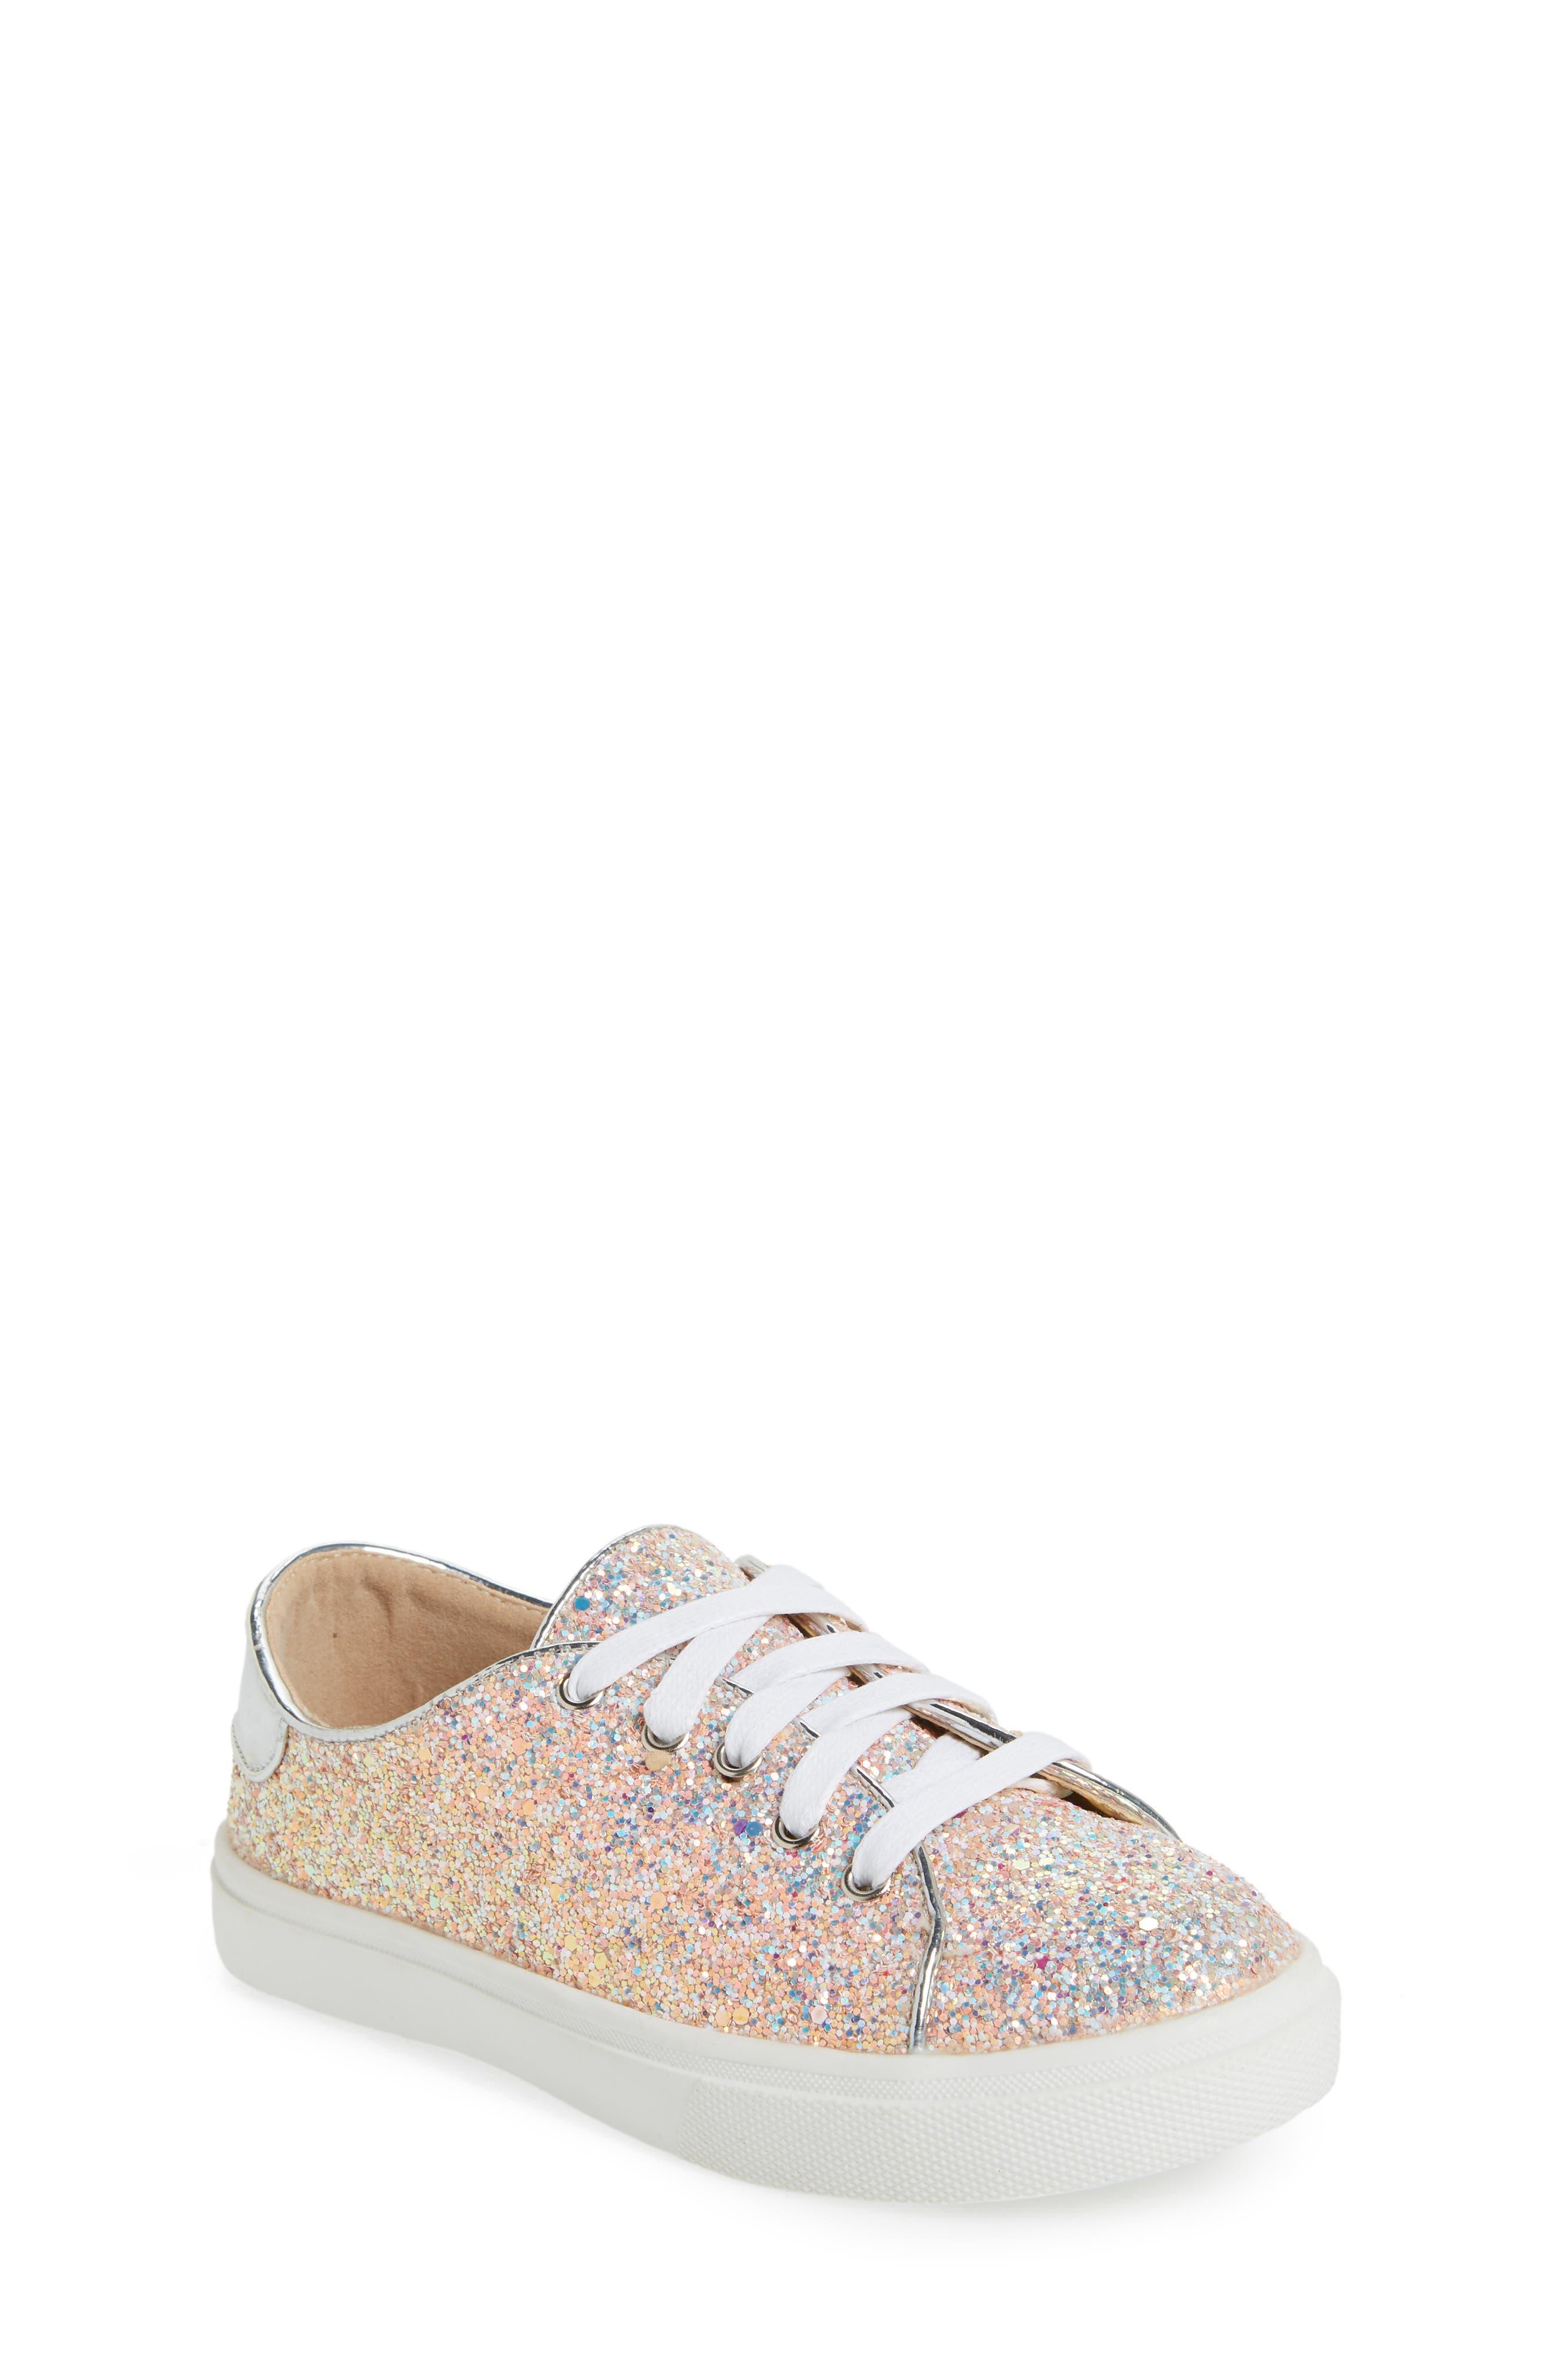 YOSI SAMRA,                             Miss Bowery Glitter Sneaker,                             Main thumbnail 1, color,                             182